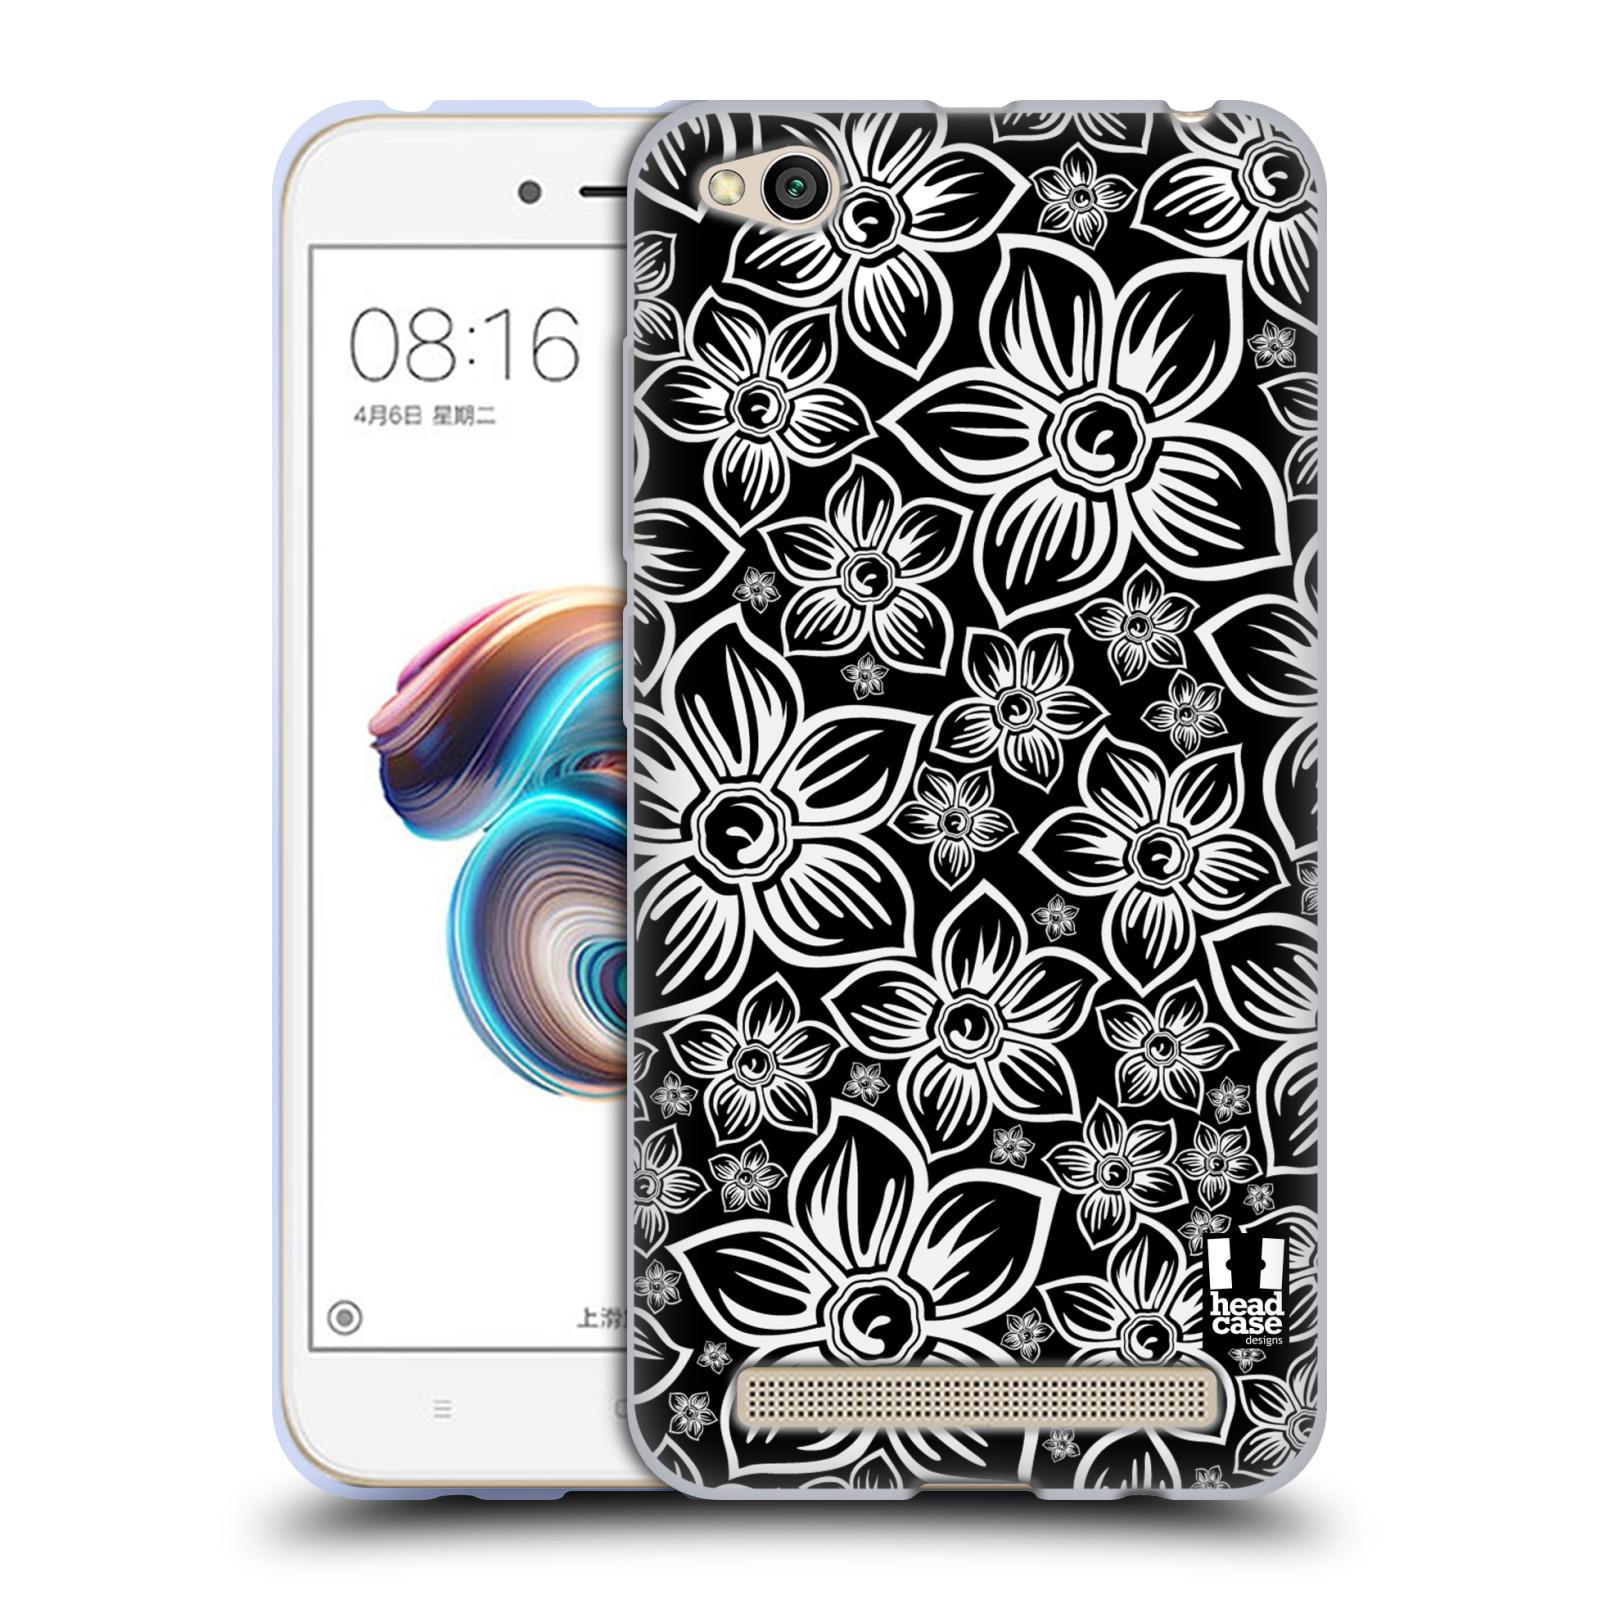 Silikonové pouzdro na mobil Xiaomi Redmi 5A - Head Case - FLORAL DAISY